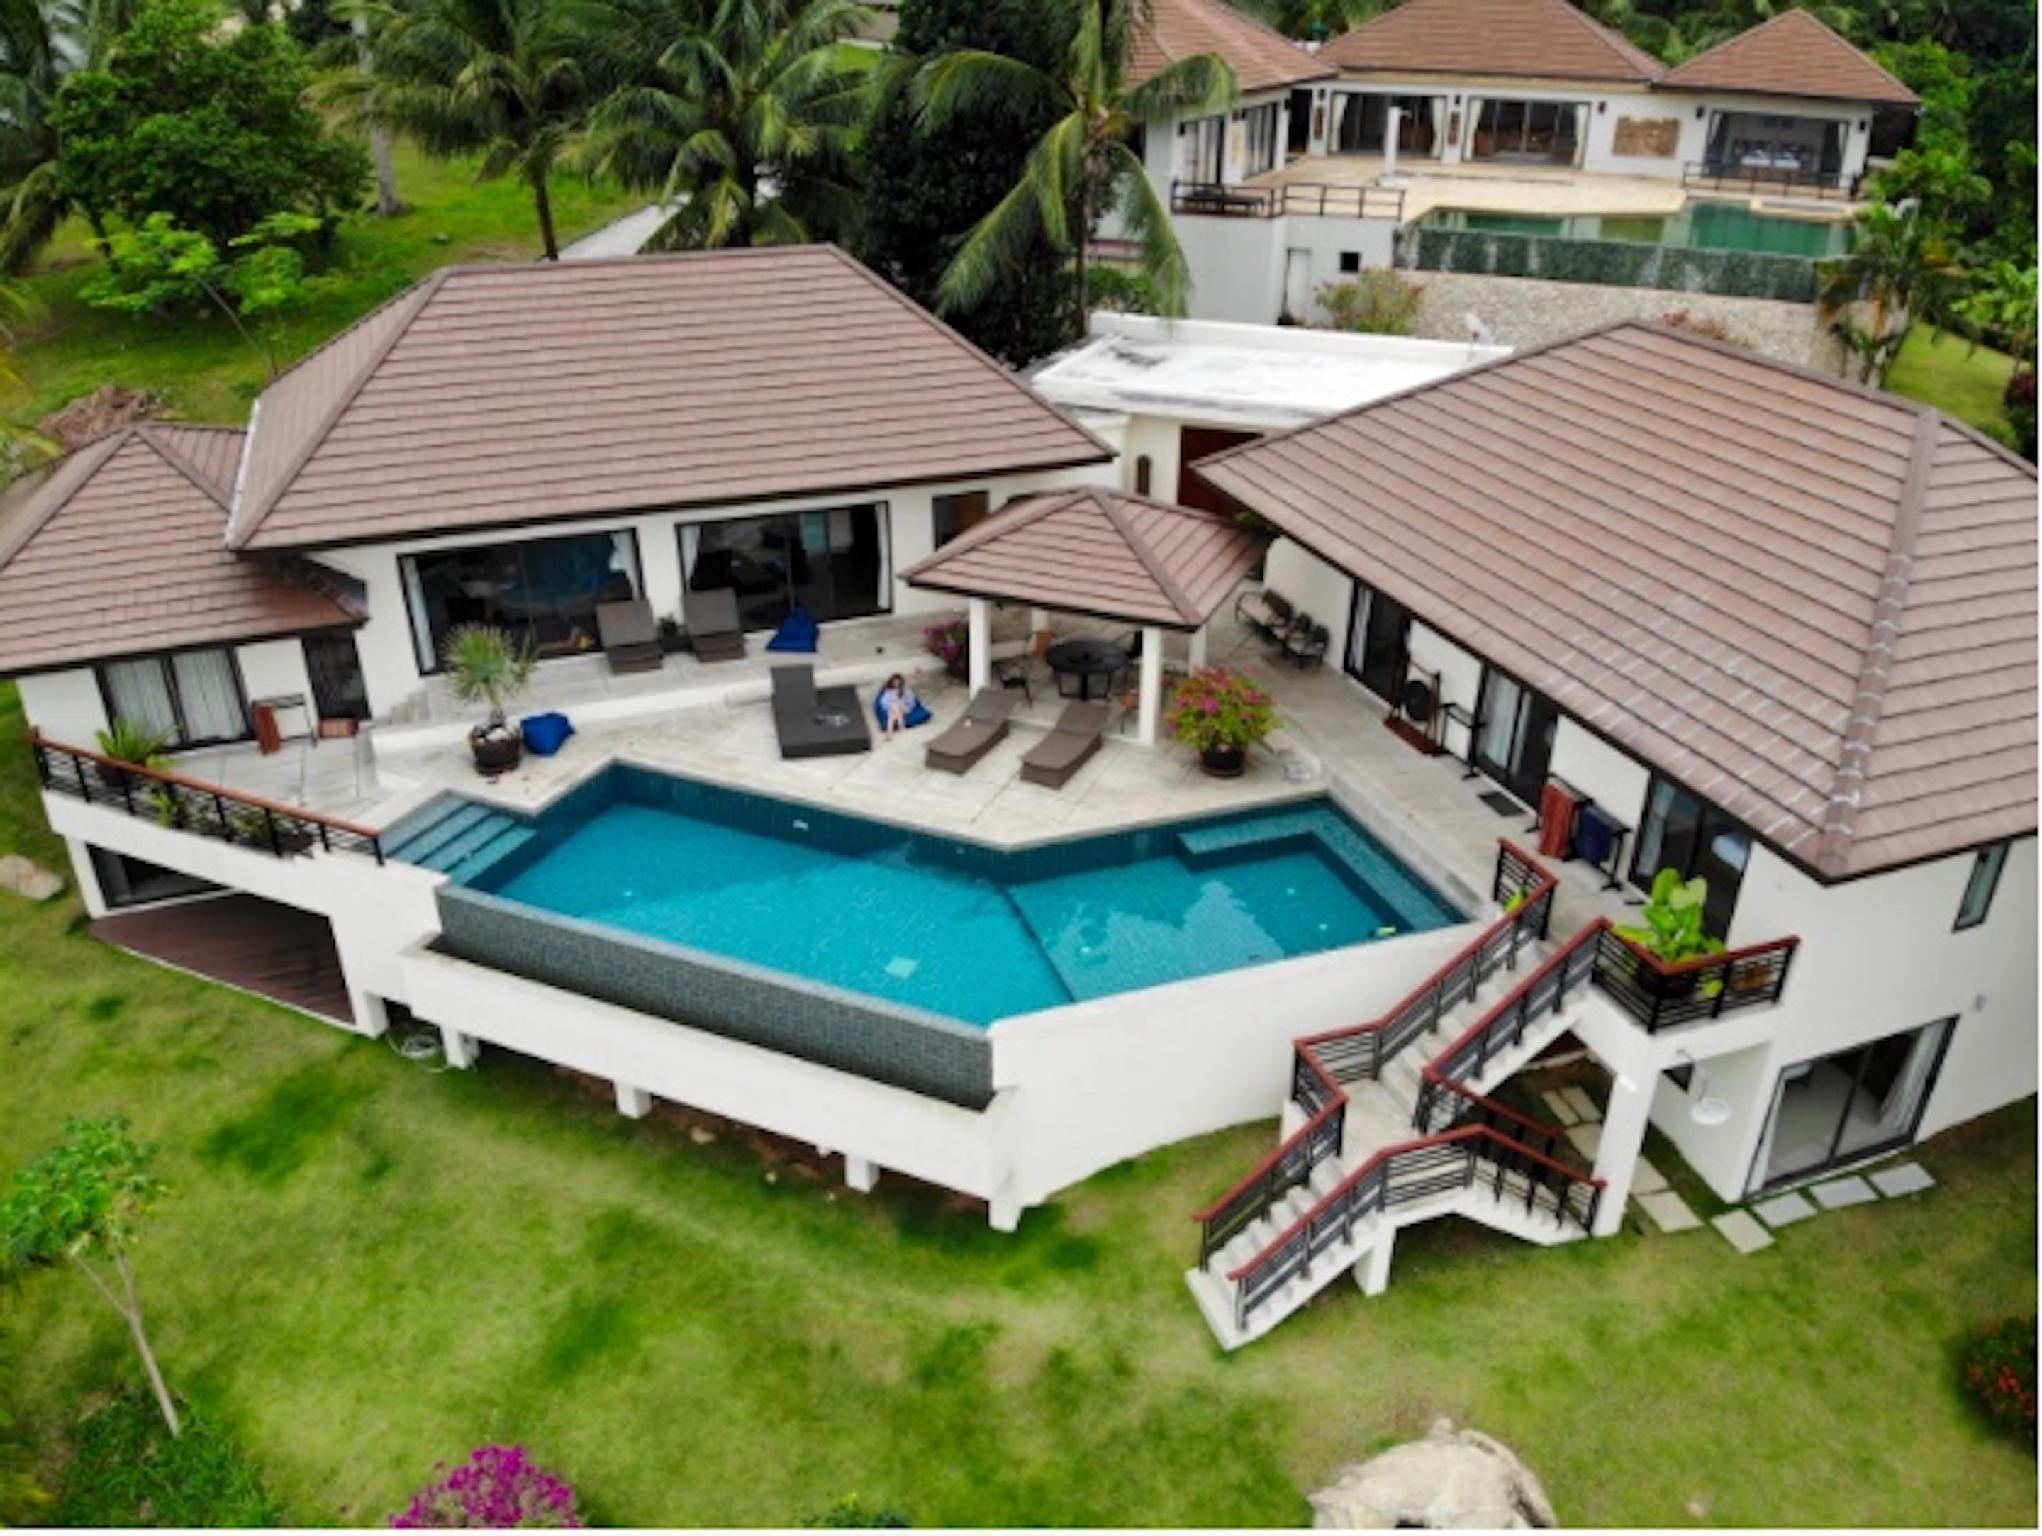 7 Bedroom Sea View Villa Angthong Hills 7 Bedroom Sea View Villa Angthong Hills